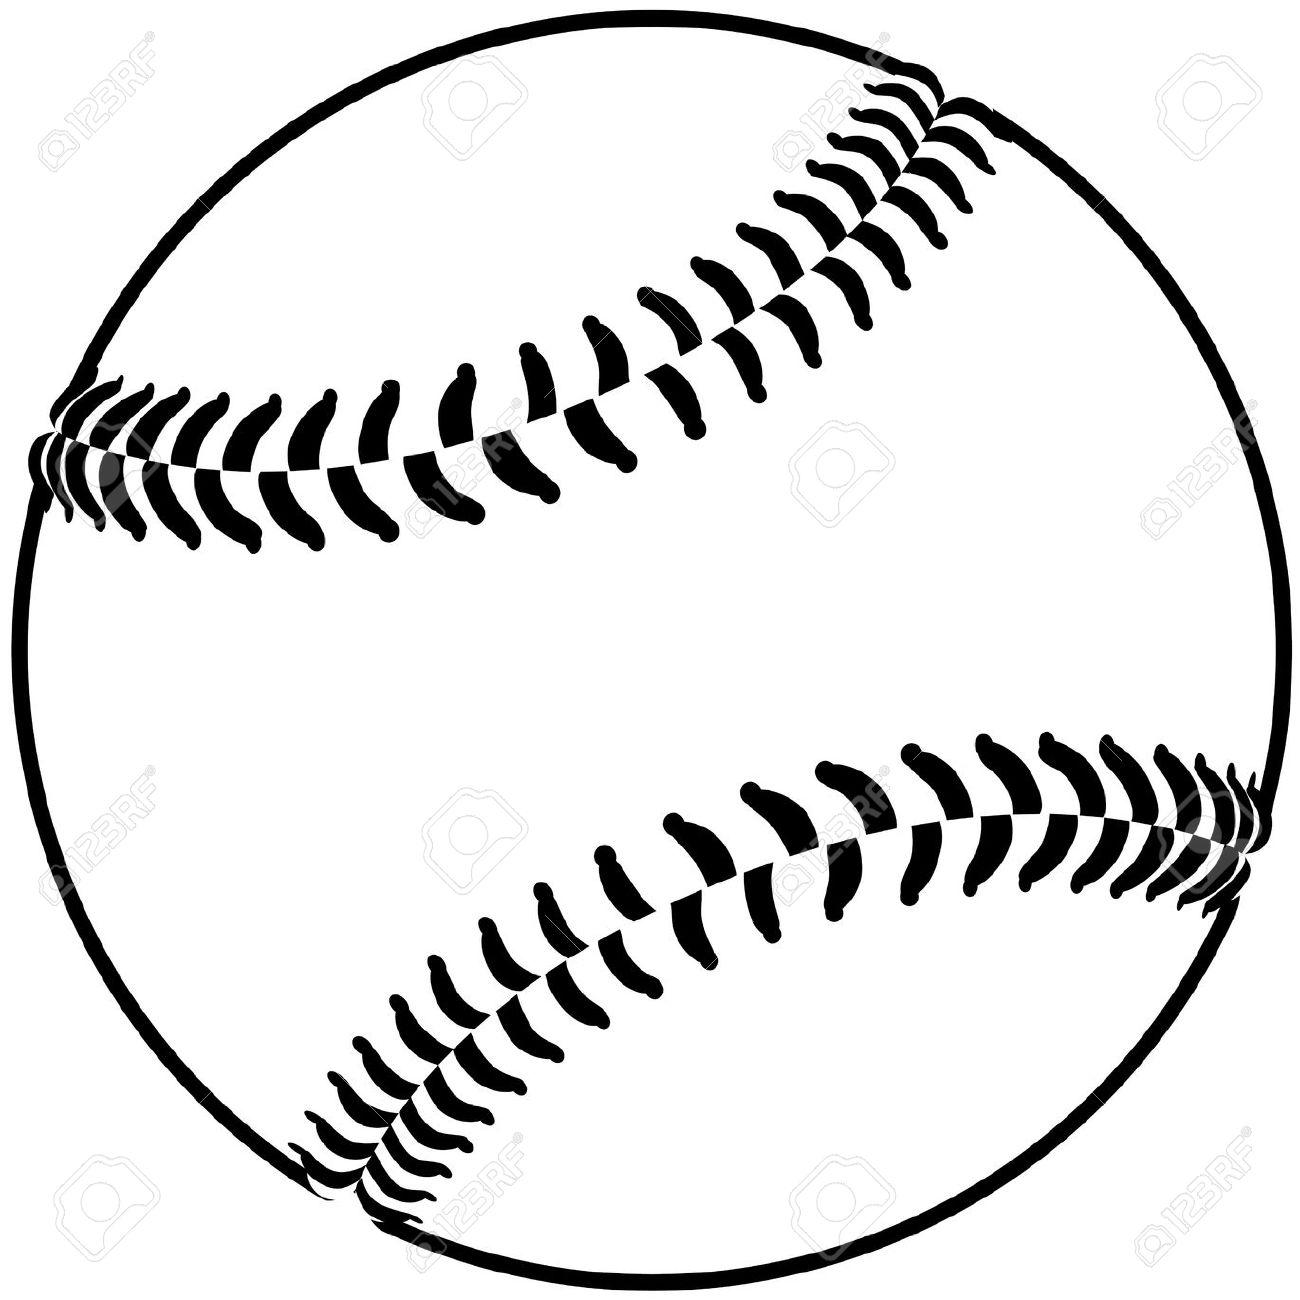 softball clipart black and white - 116.5KB